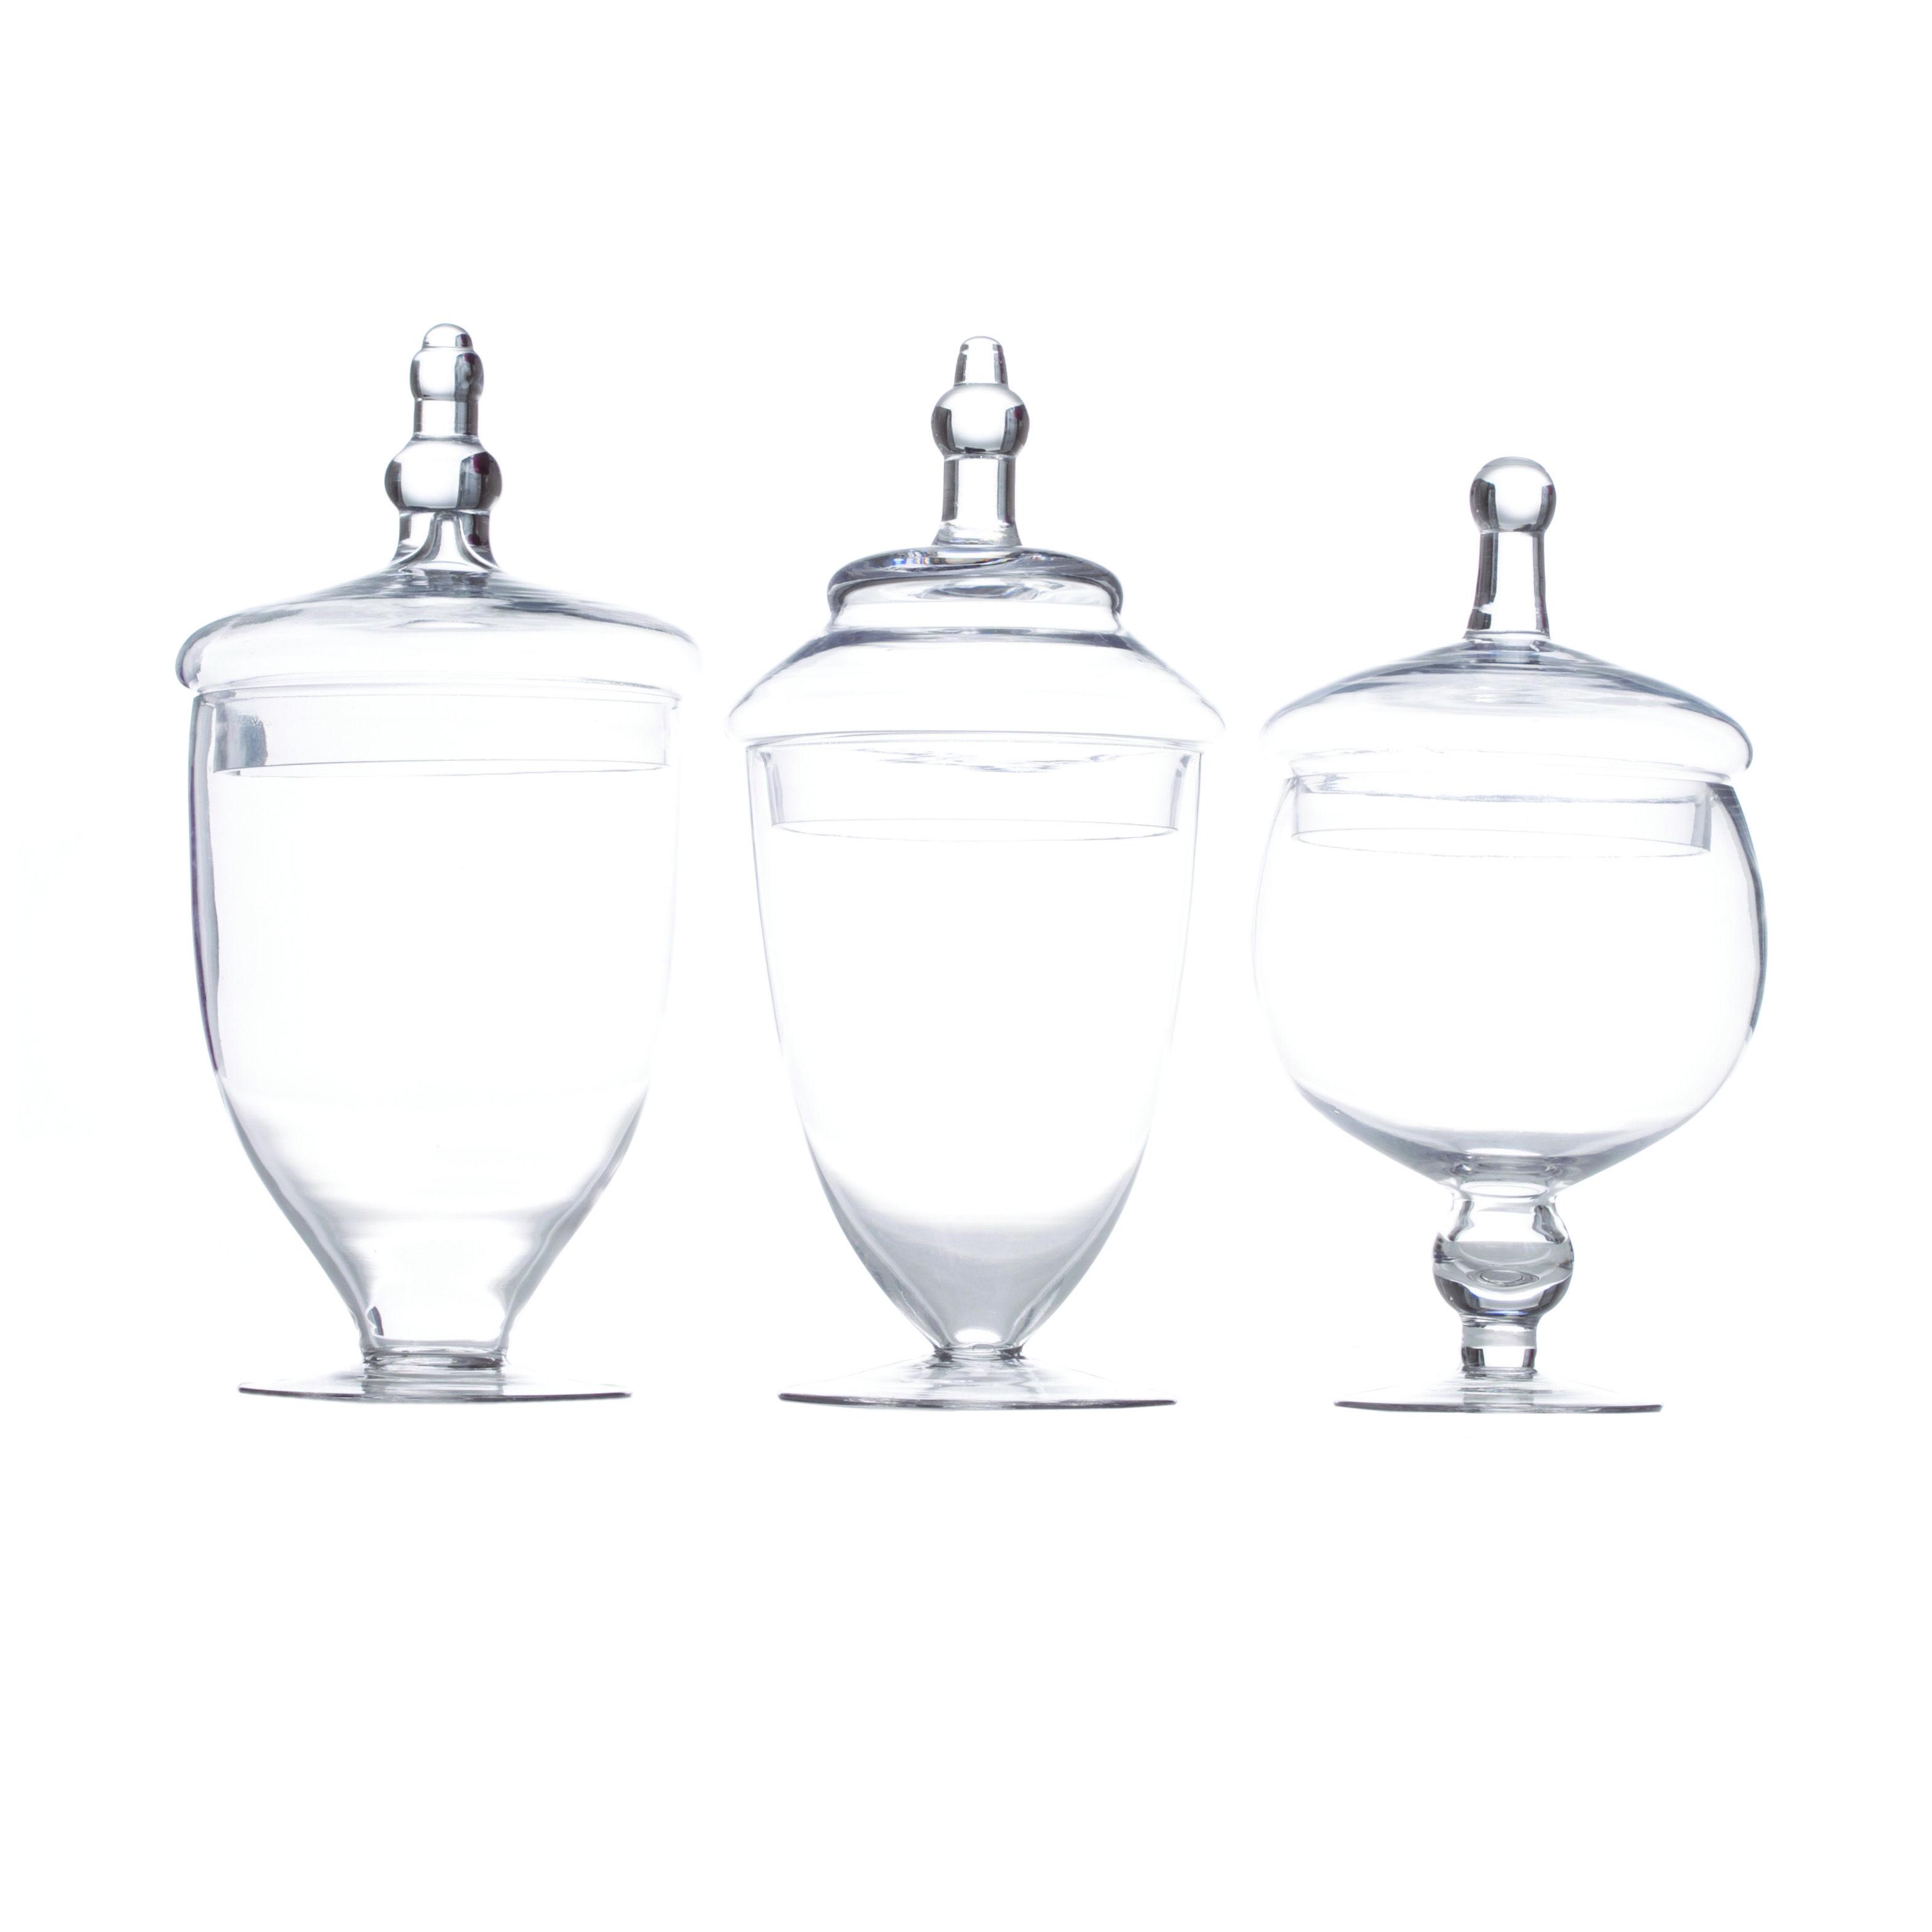 Glass apothecary jars set of 3 3998 koyal wholesale dimensions candy buffet jars candy jars set glass apothecary jars set of reviewsmspy